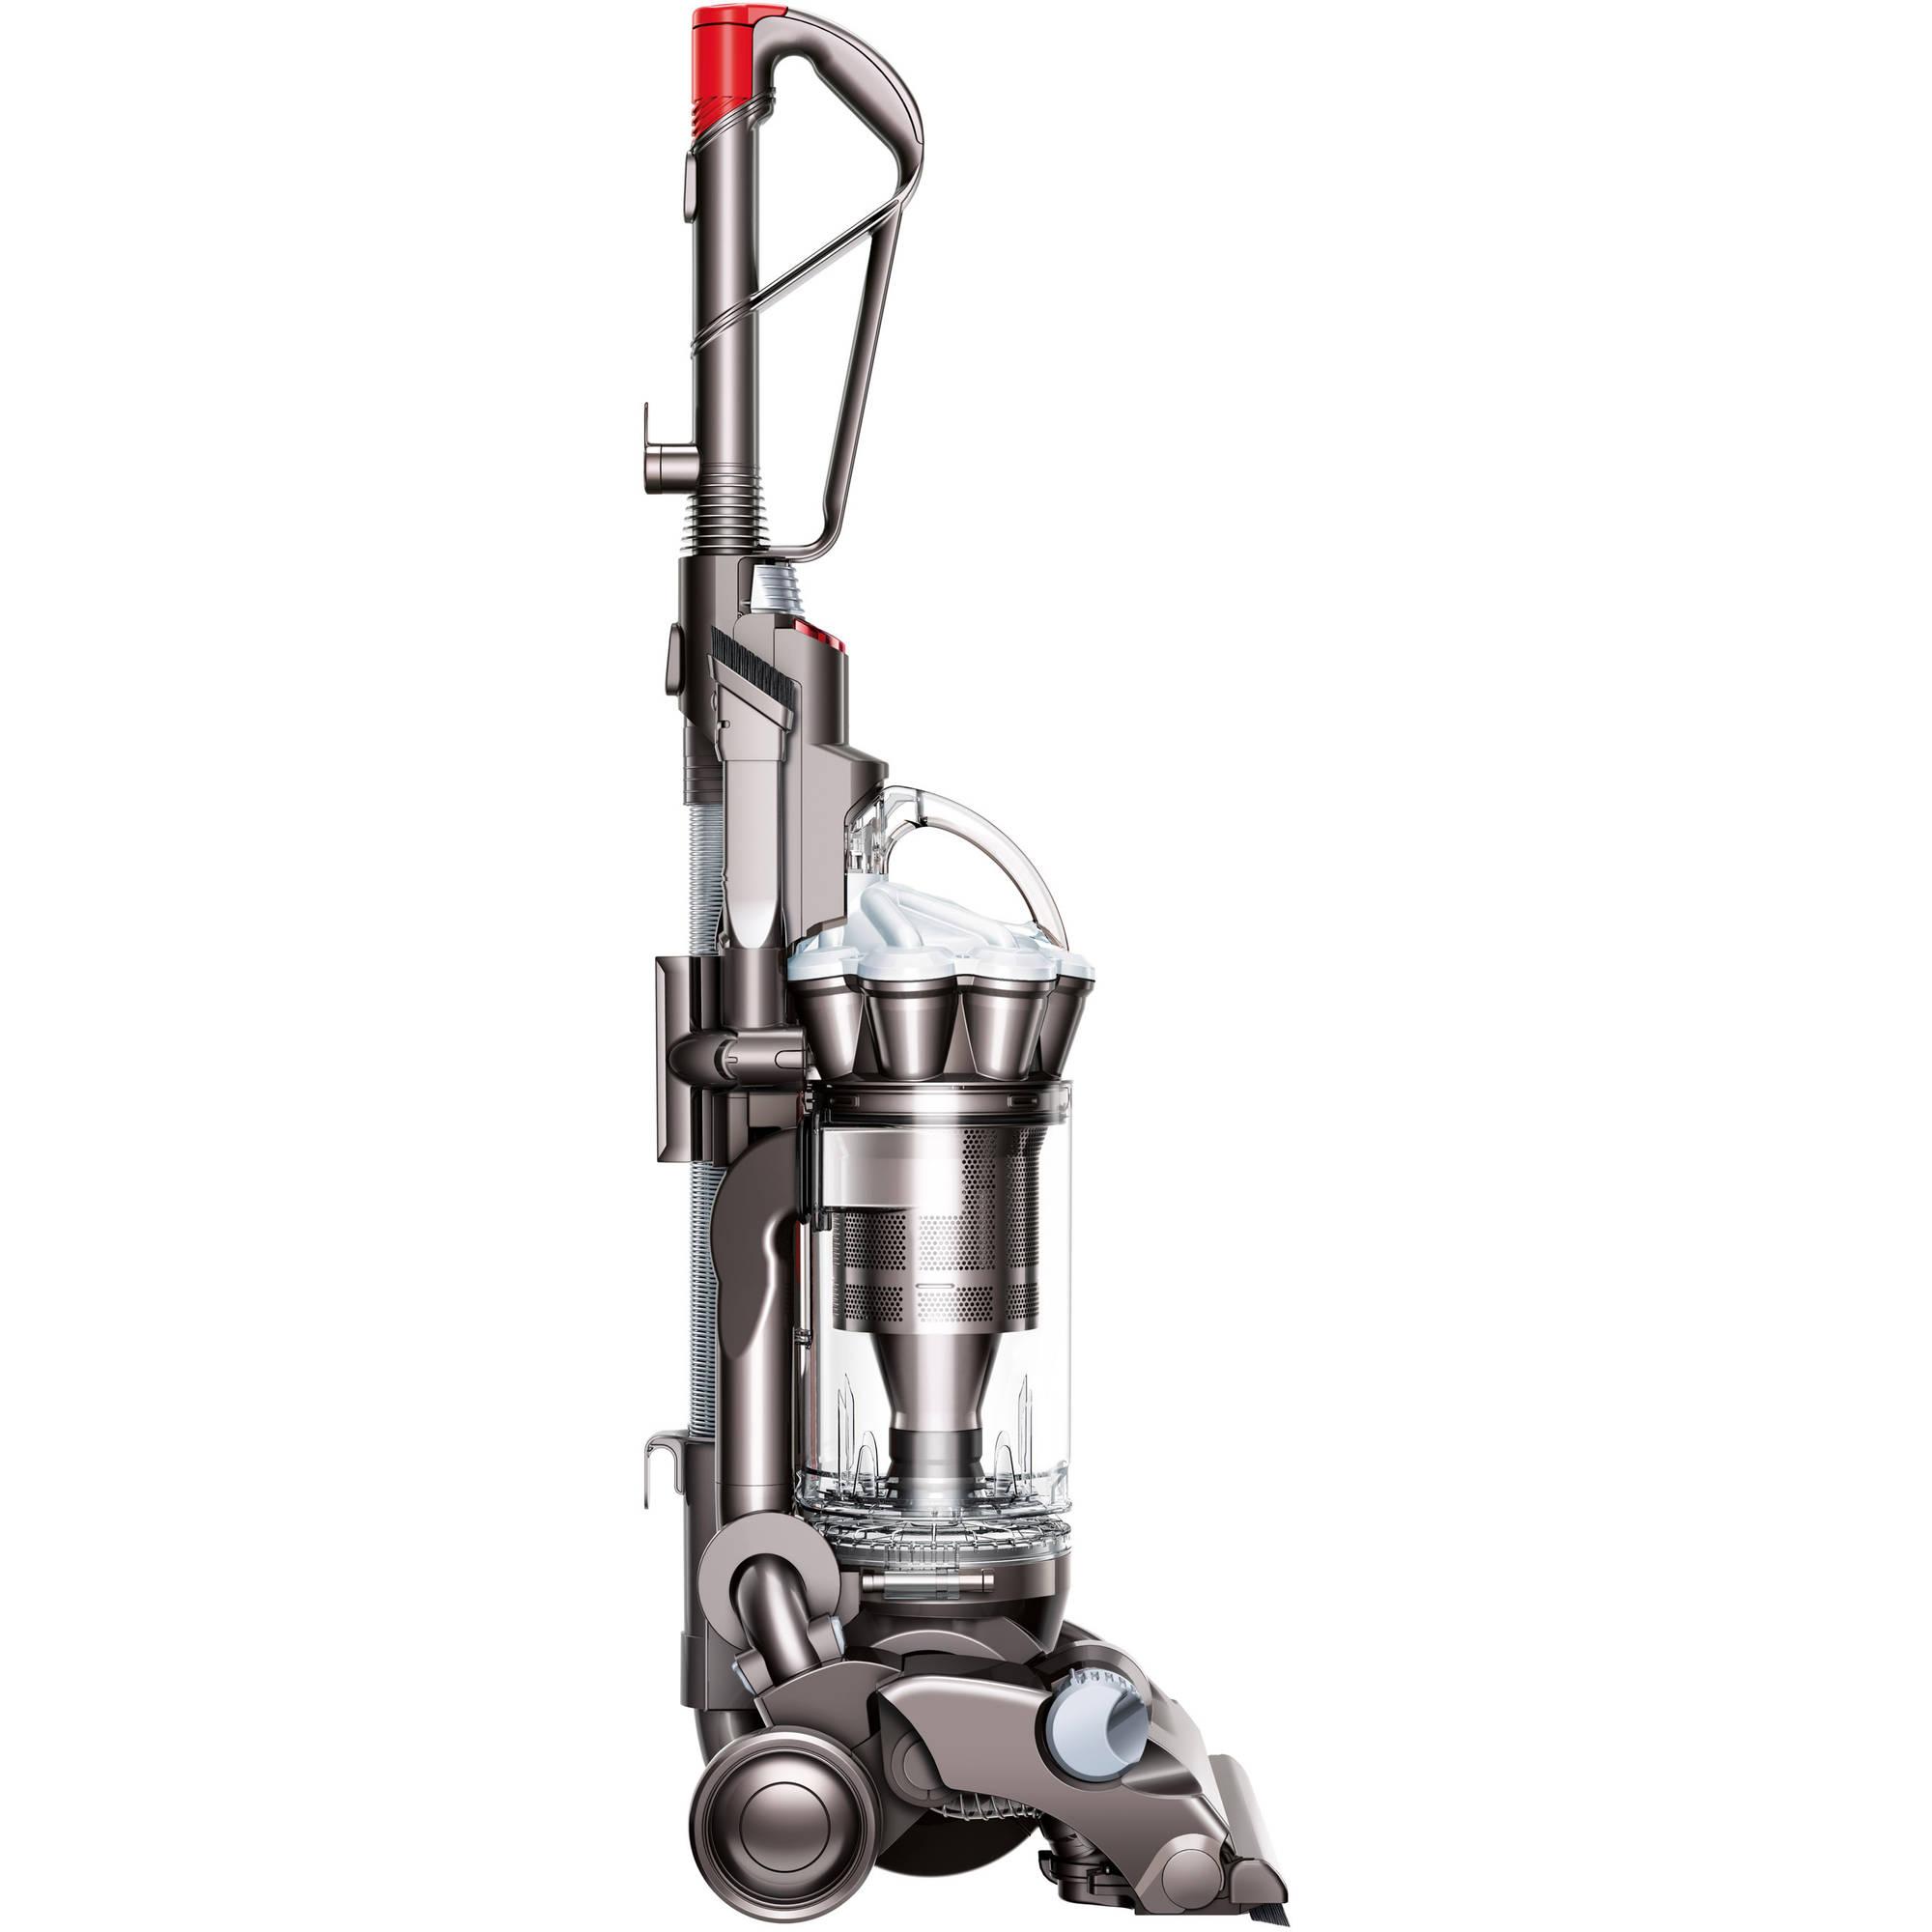 Dyson DC33 Multifloor Bagless Upright Vacuum at Walmart, $199